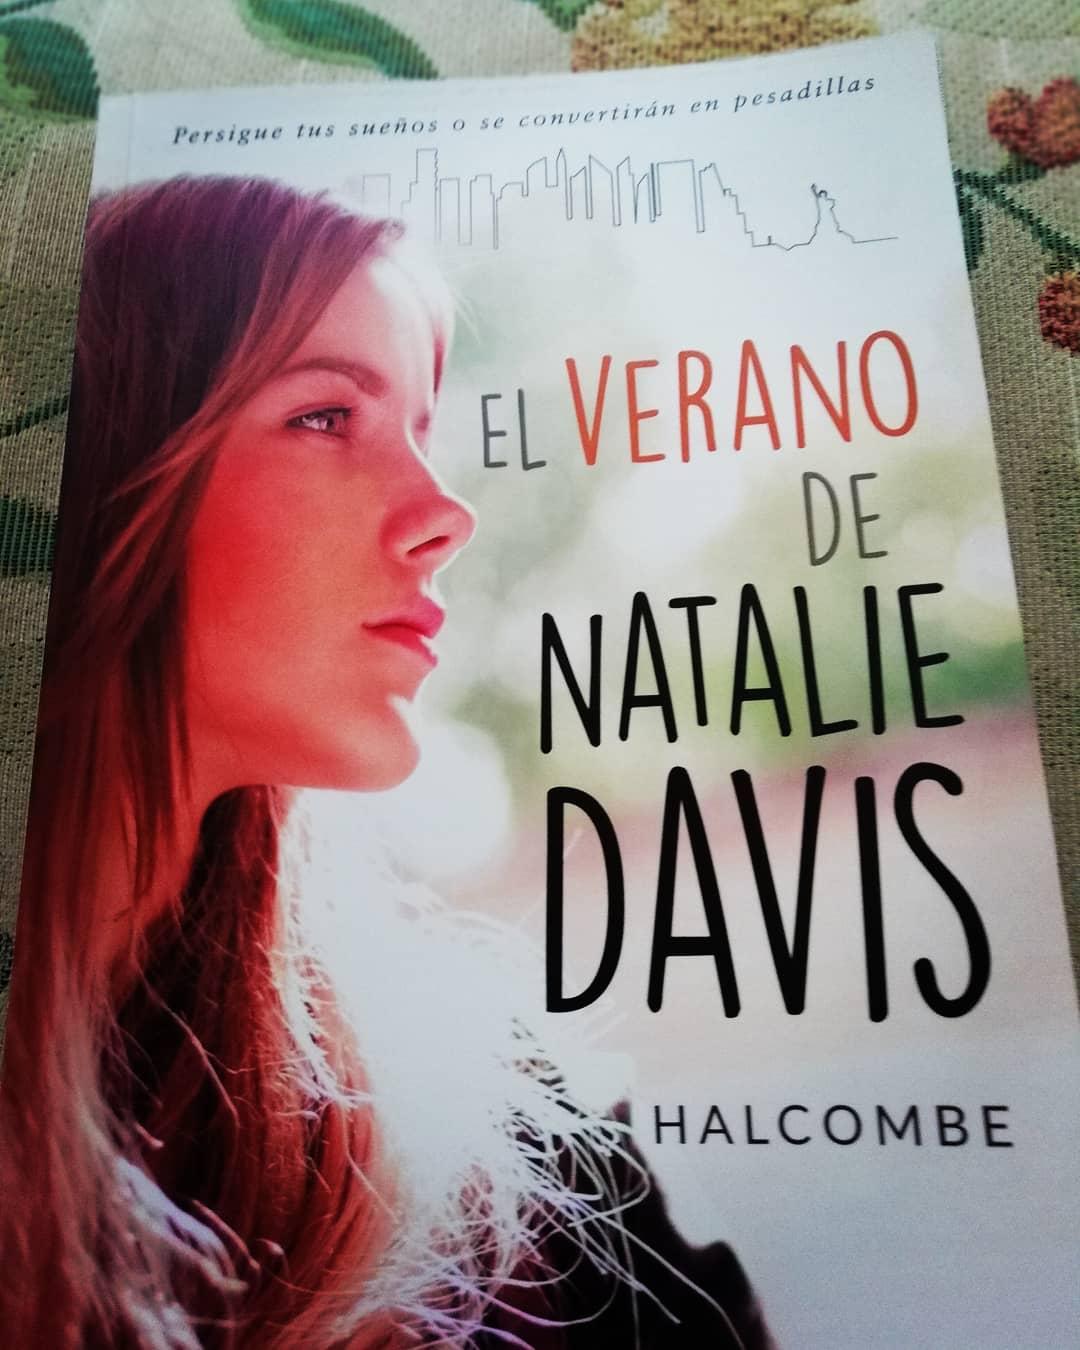 My new novel; El verano de Natalie Davis (the summer of